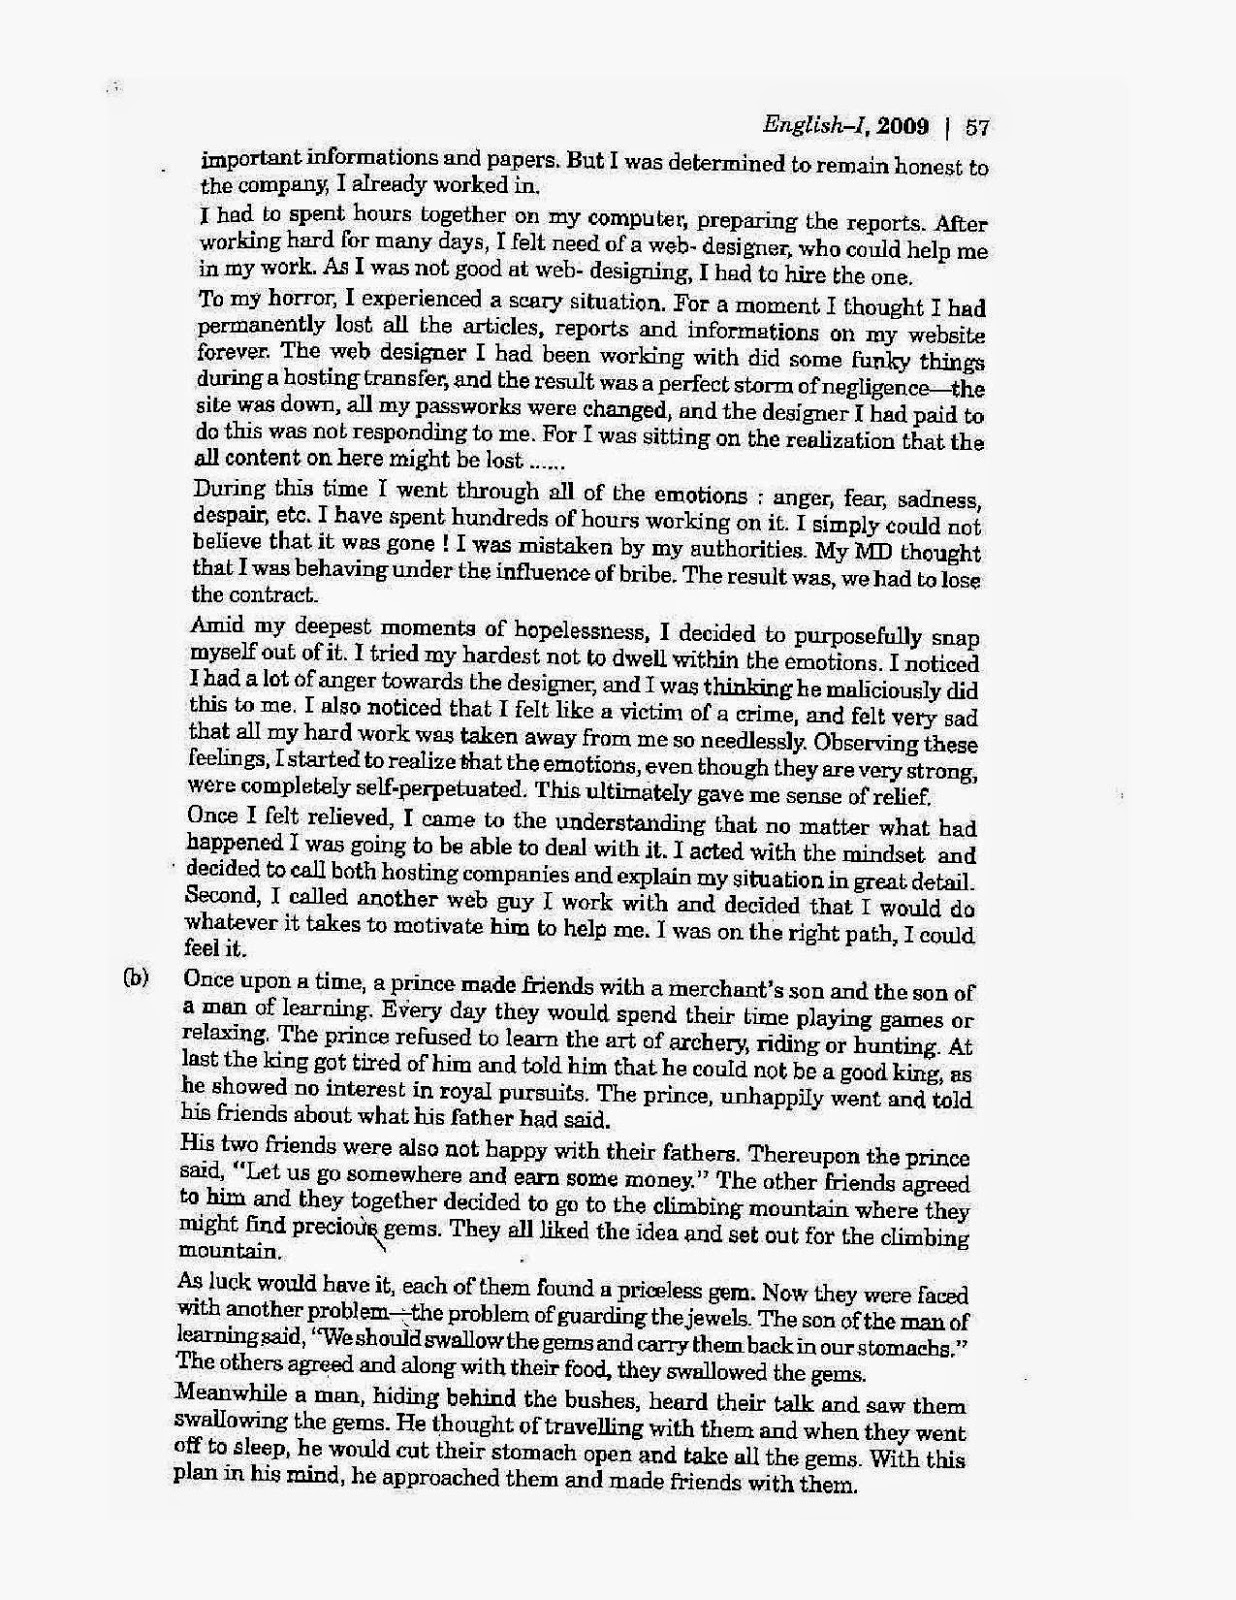 007 Grade English Essays Icse2benglish2bclass2b102b2009 Page Wonderful 12 Essay Examples Narrative Provincial Exam Sample Manitoba Full